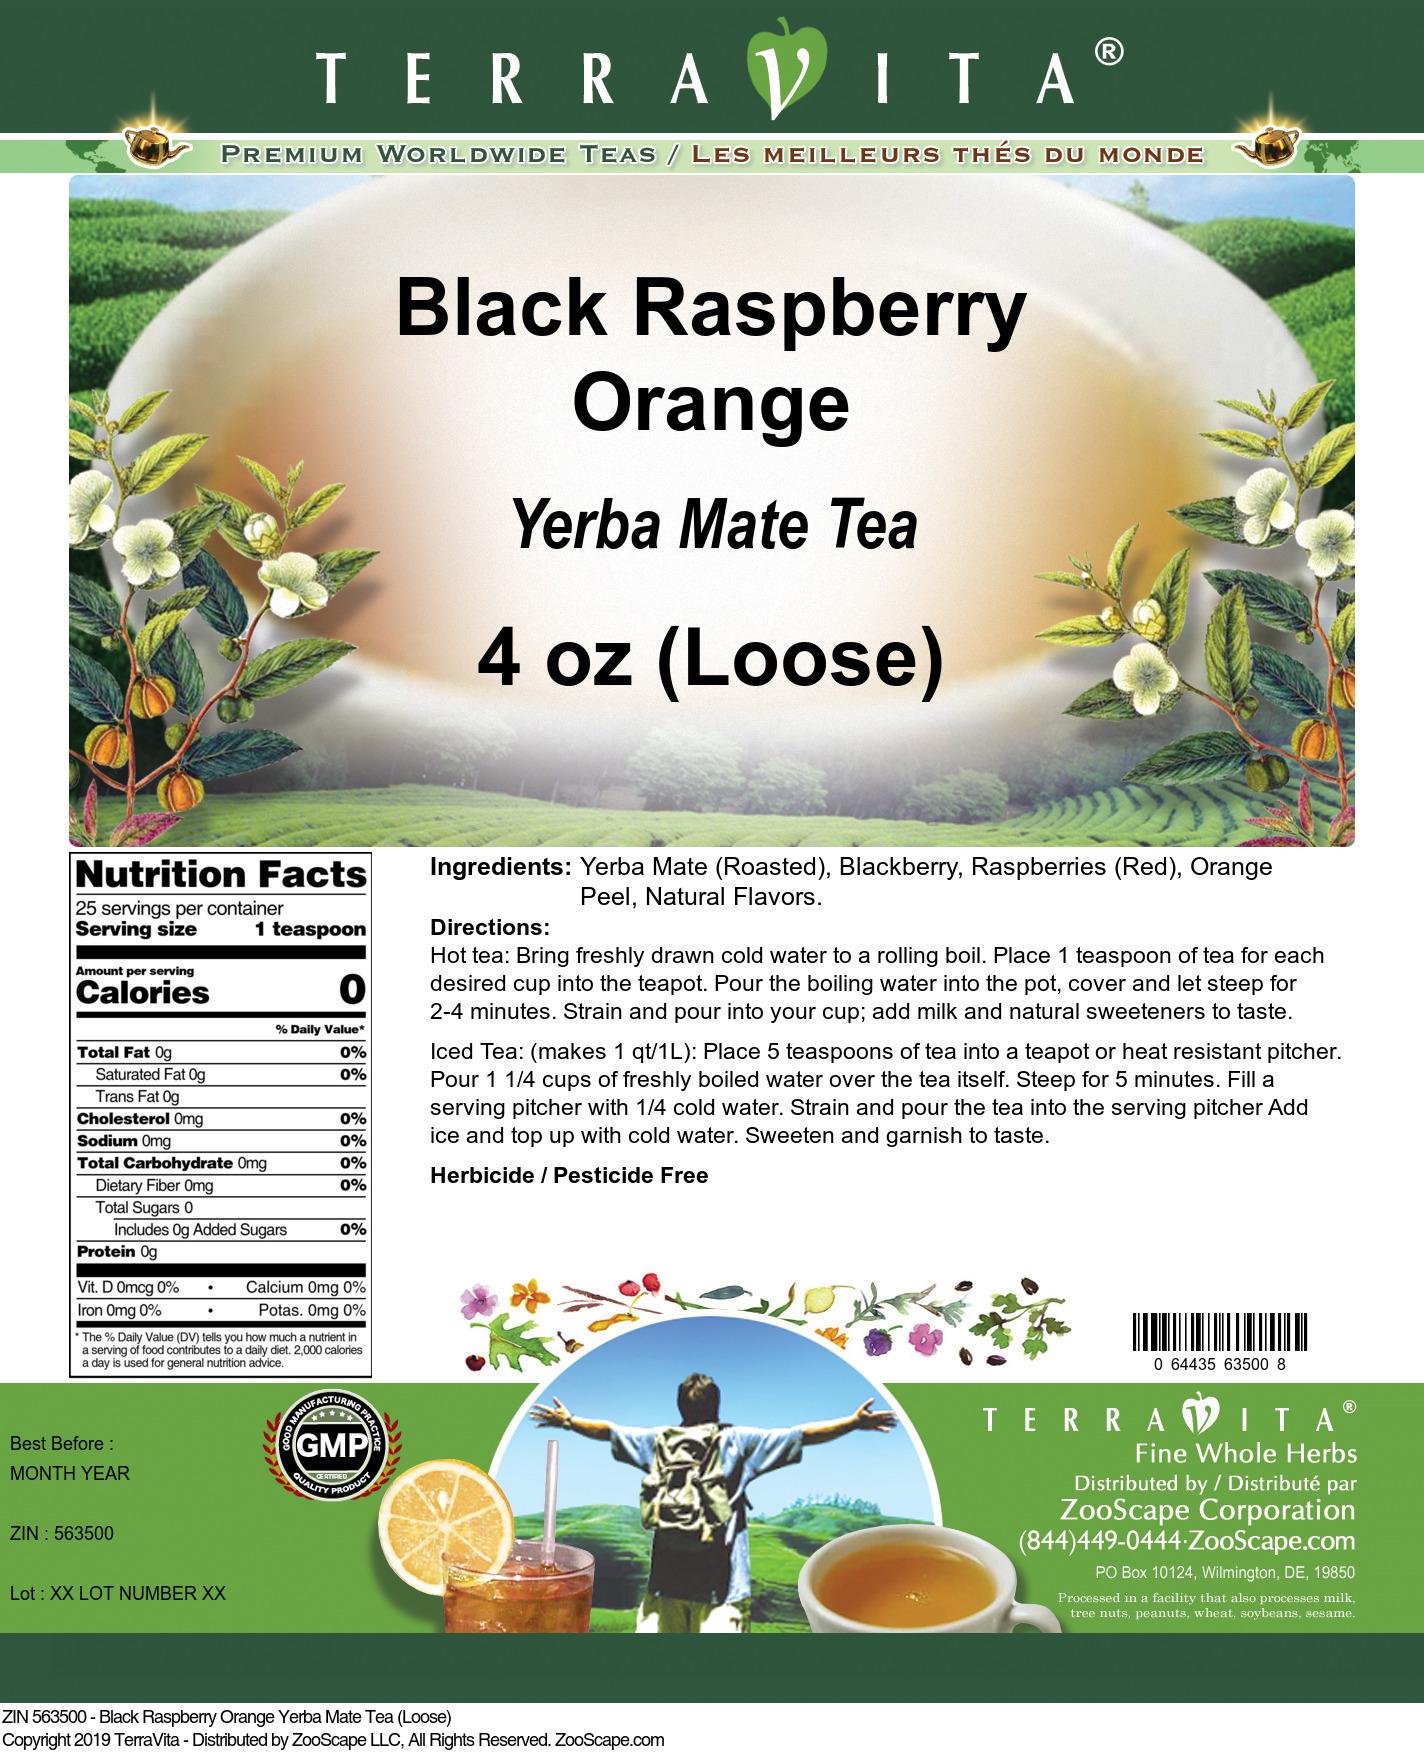 Black Raspberry Orange Yerba Mate